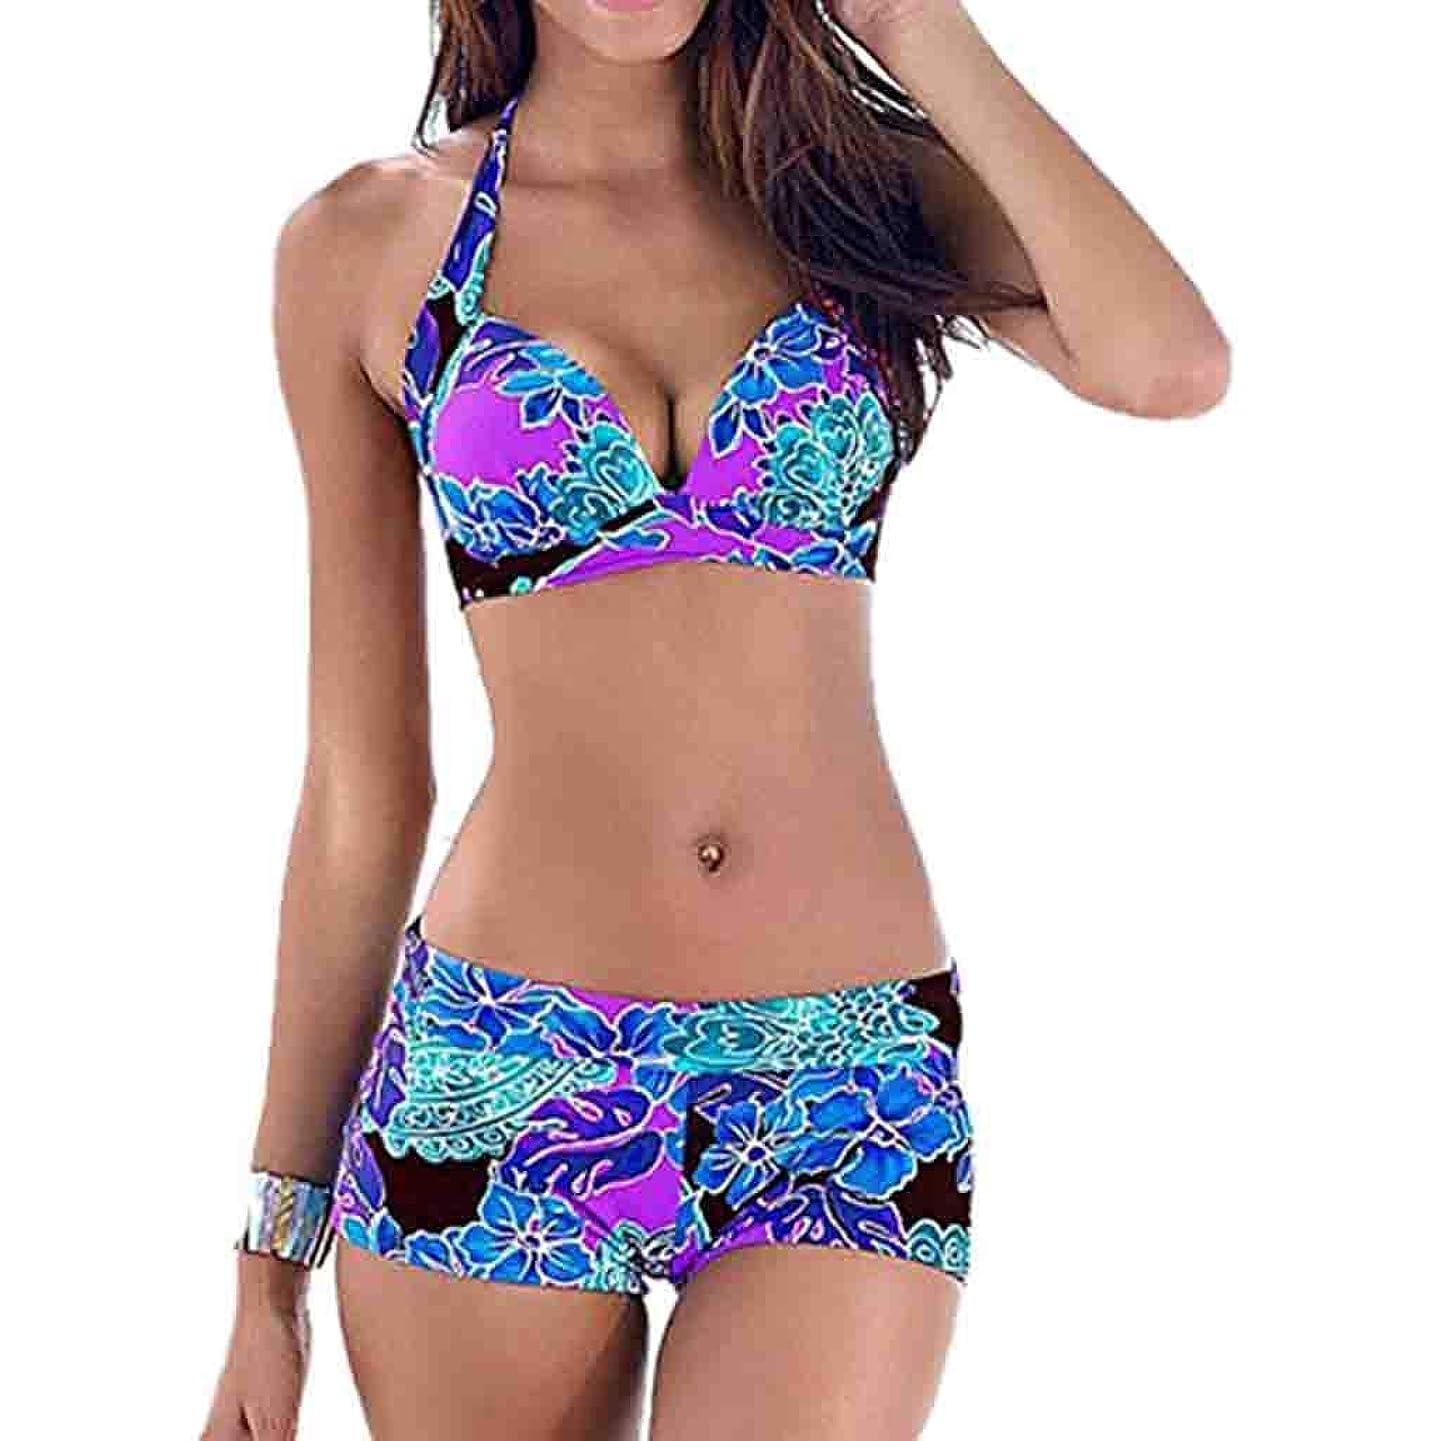 Womens Sexy Bikini Swimsuit,Floral Push up Padded Bra Two Piece Swimwear Shorts Bottom Bathing Suit hjcvctievsbx